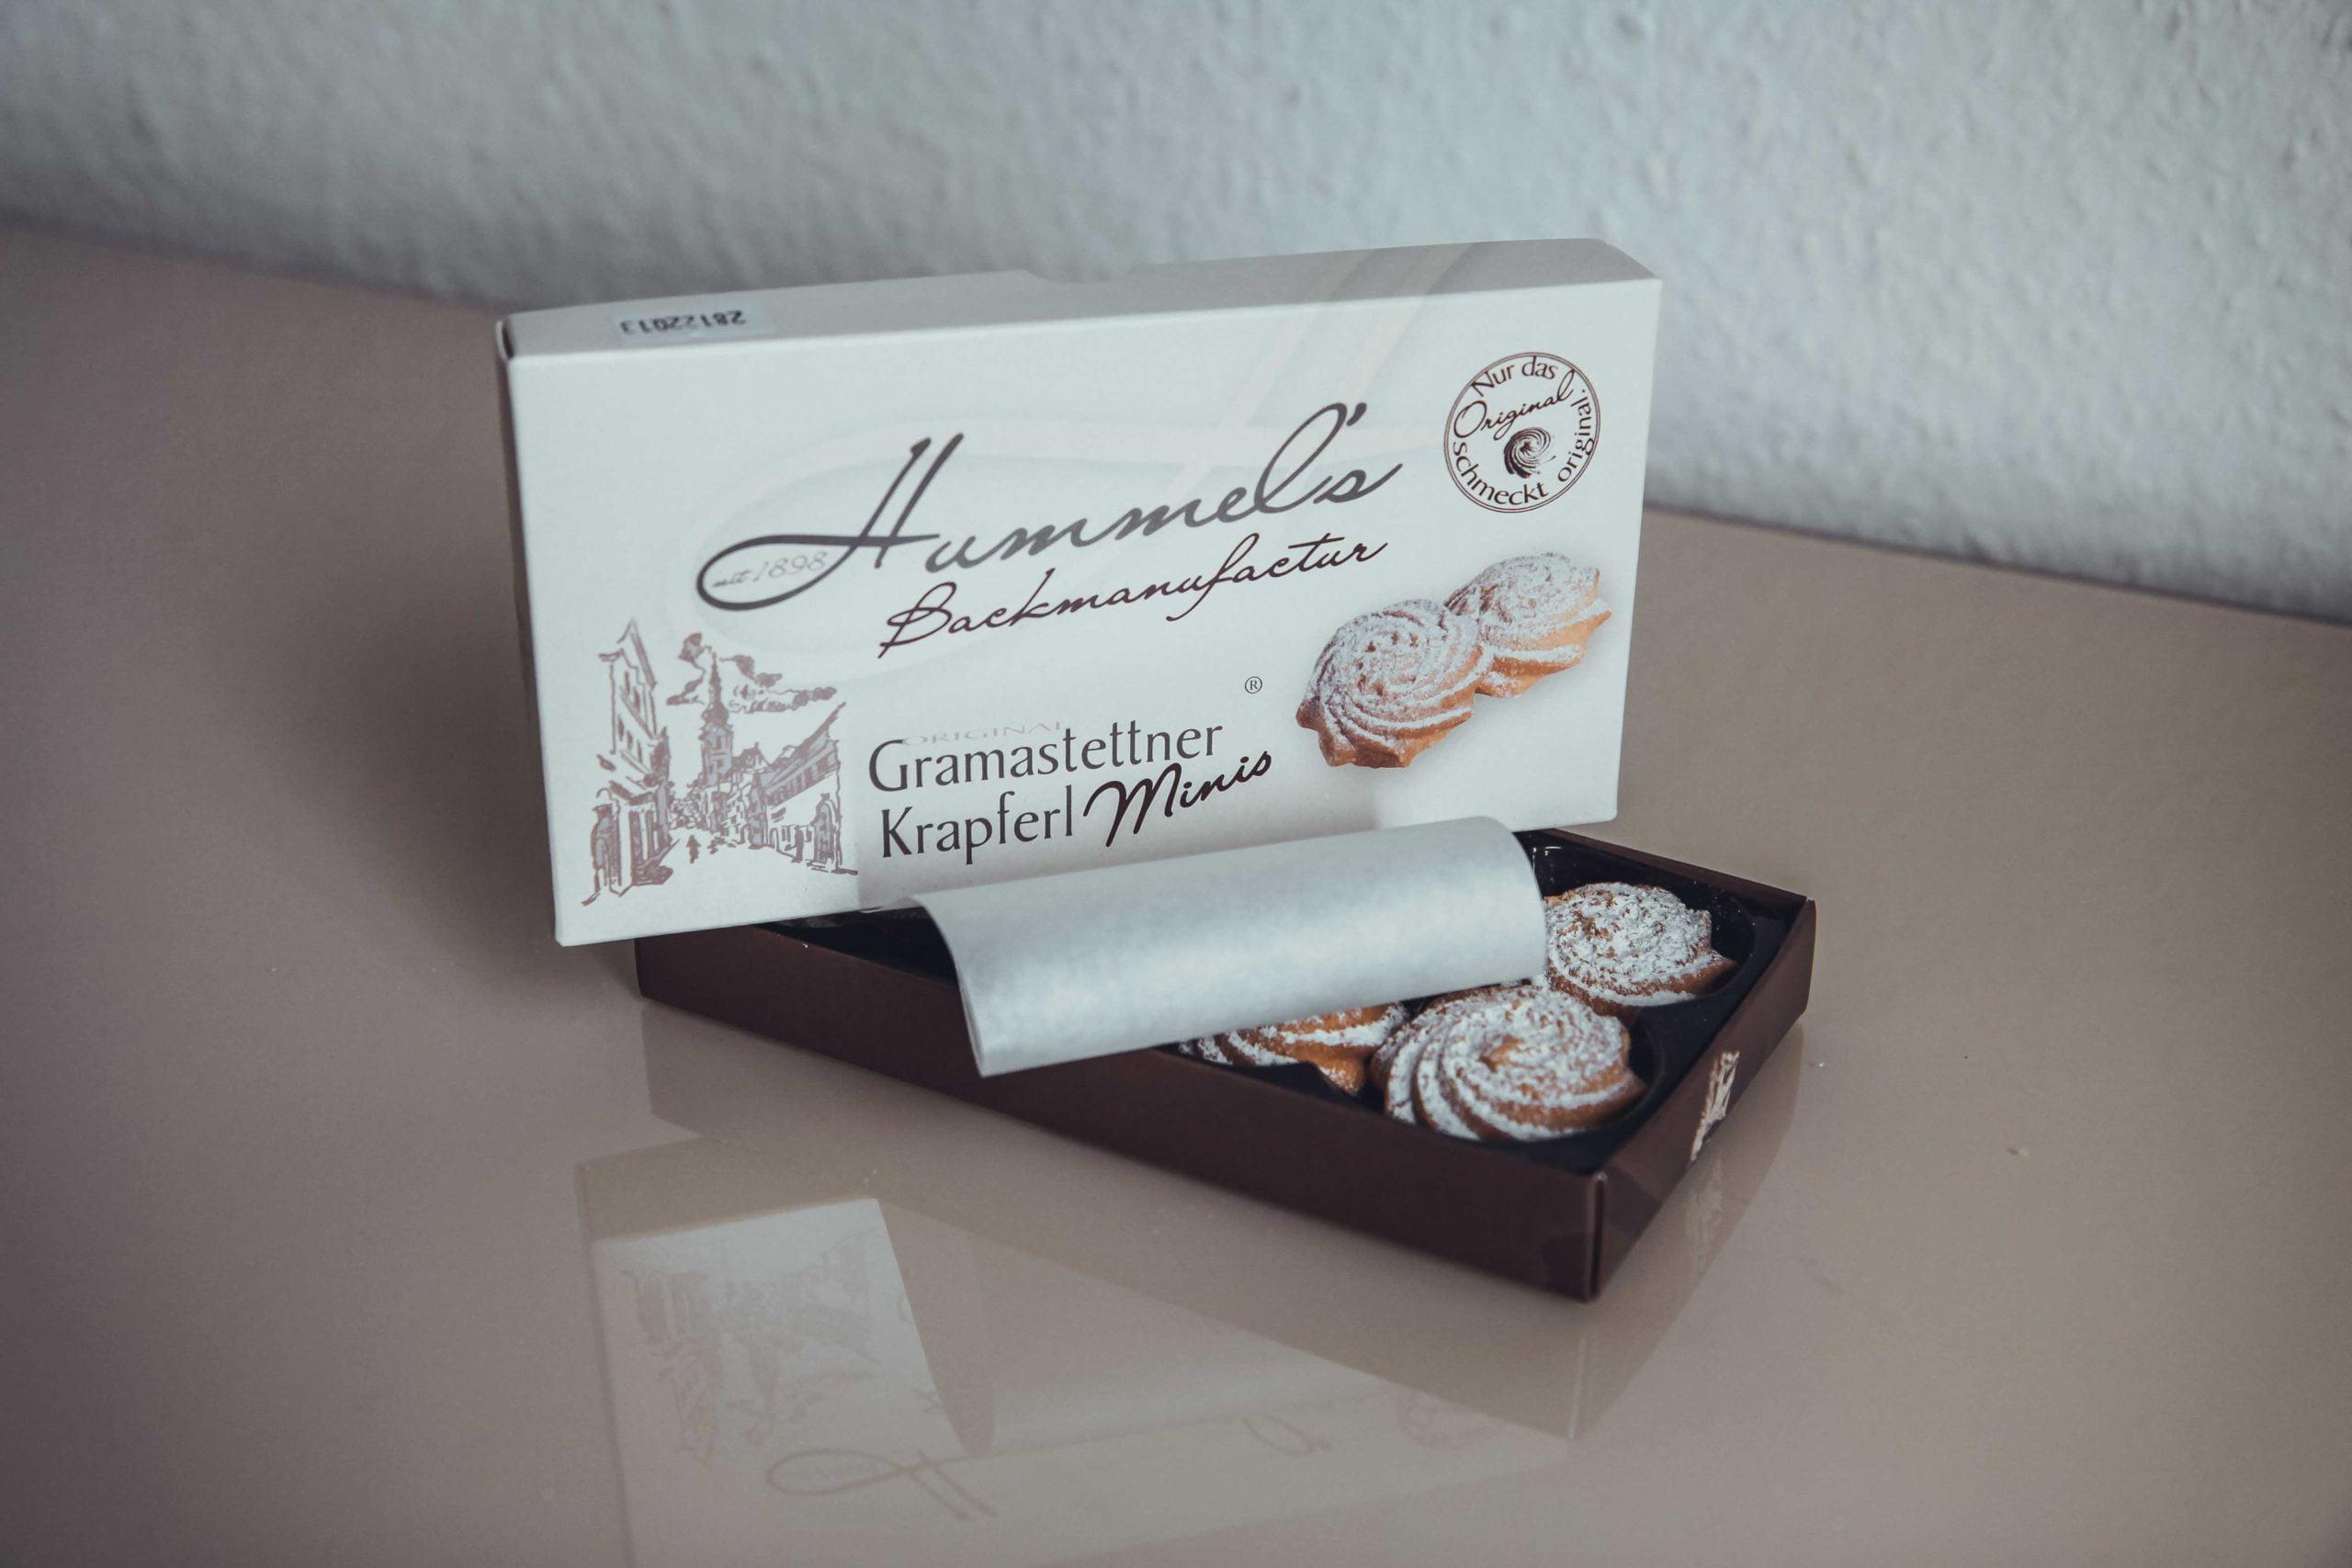 Hummel's Gramastettner Krapferl Minis